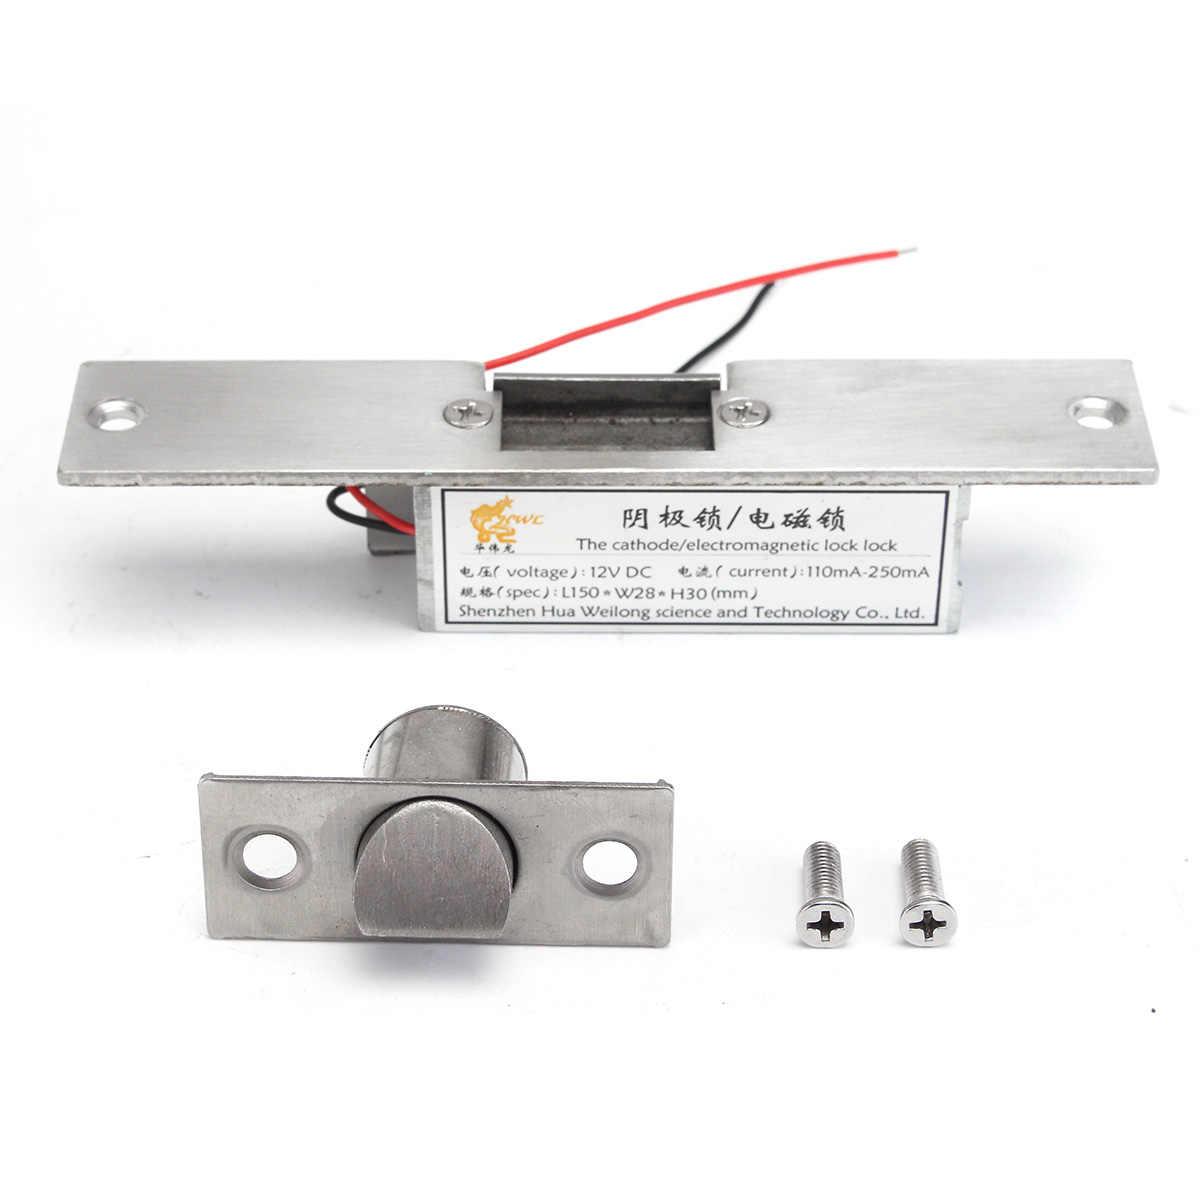 NIEUWE Safurance 12 v Fail Safe NC Kathode Elektrische Strike Lock Voor Toegangscontrole Hout Metalen Deur Home Security